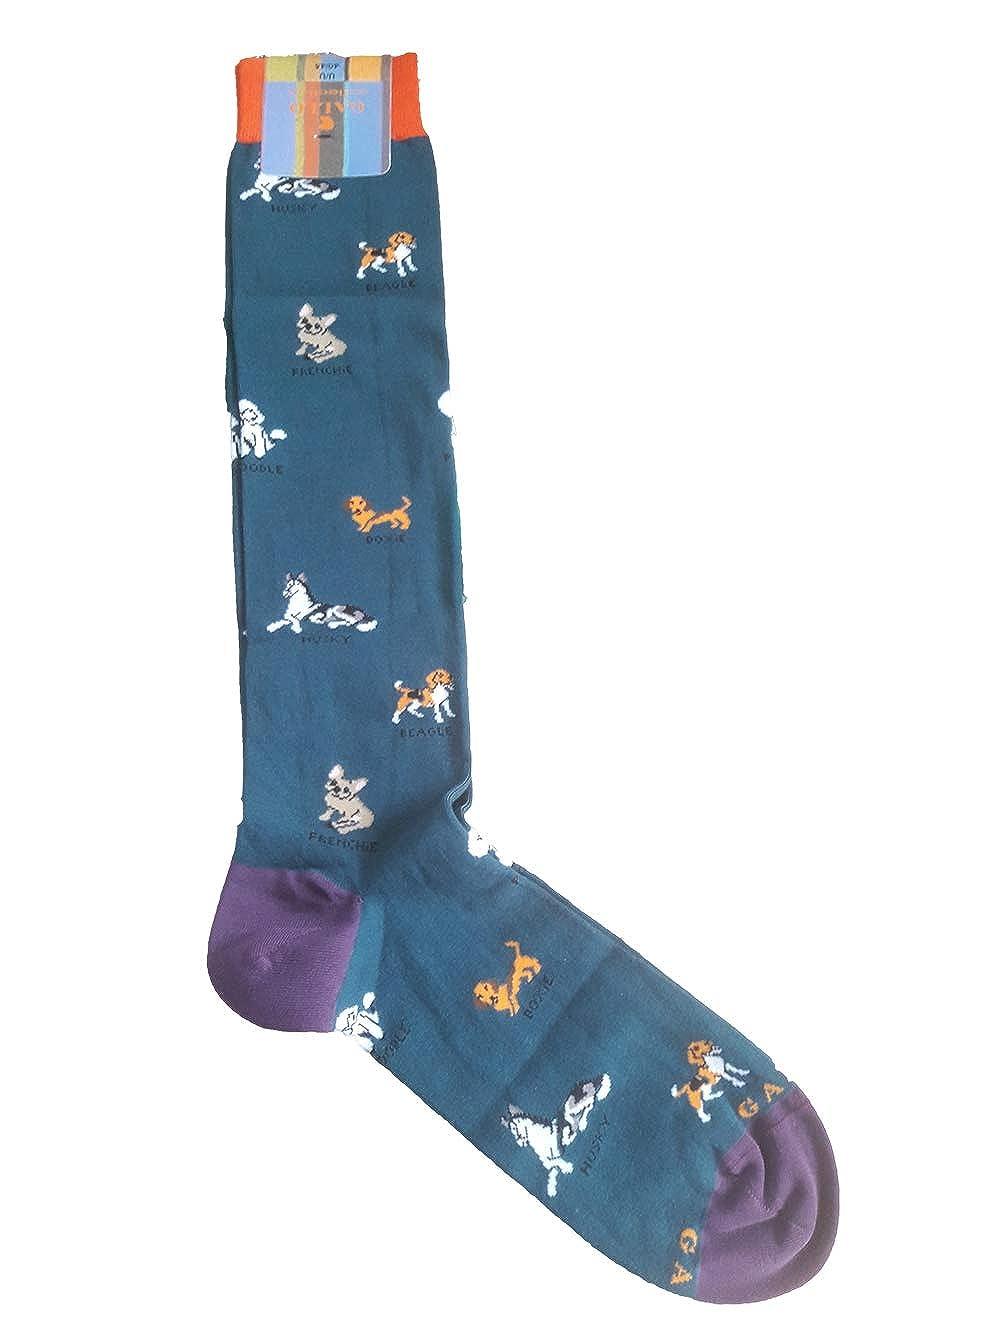 Gallo calze uomo lunghe fantasia cani tg.40-45 ap508568